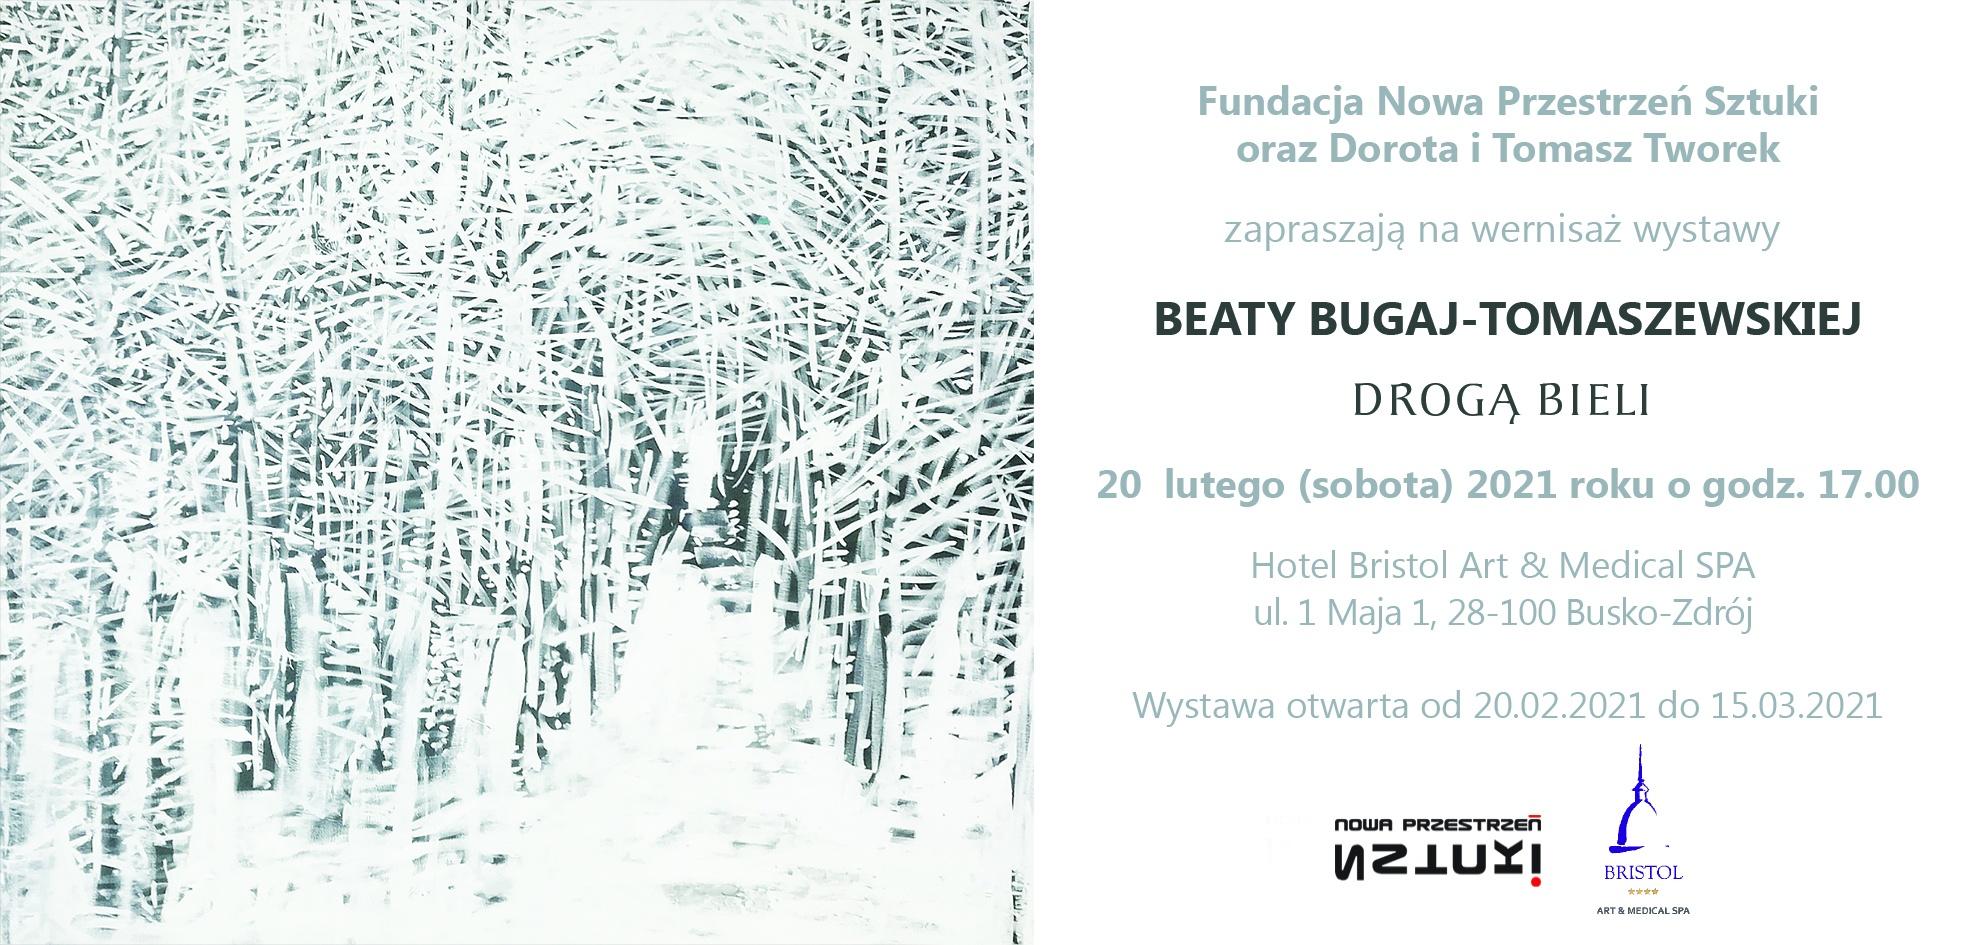 """Drogą bieli"" Beata Bugaj-Tomaszewska"